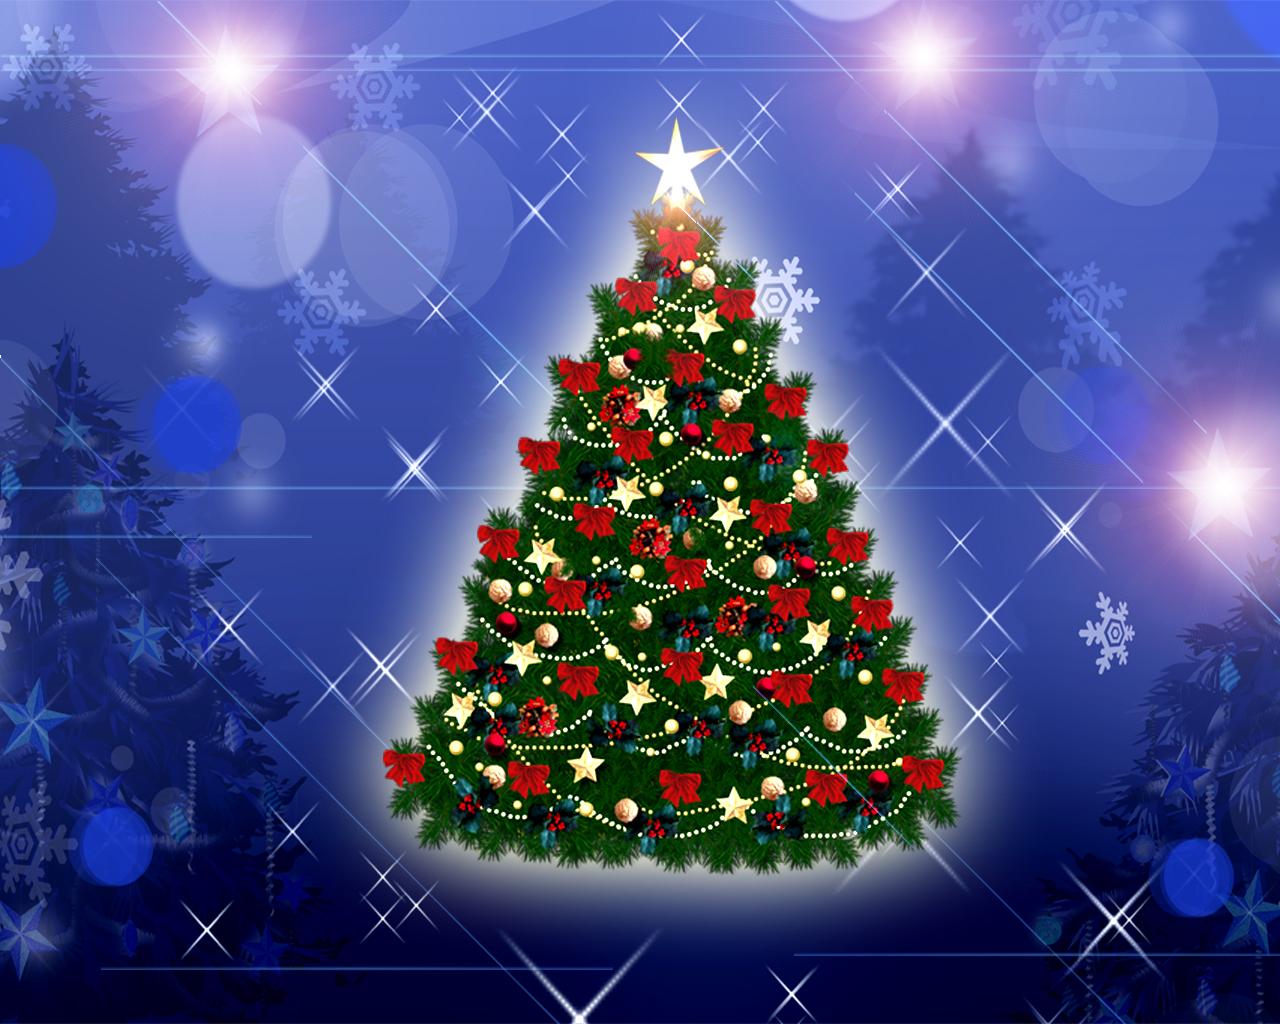 historia del arbol de navidad